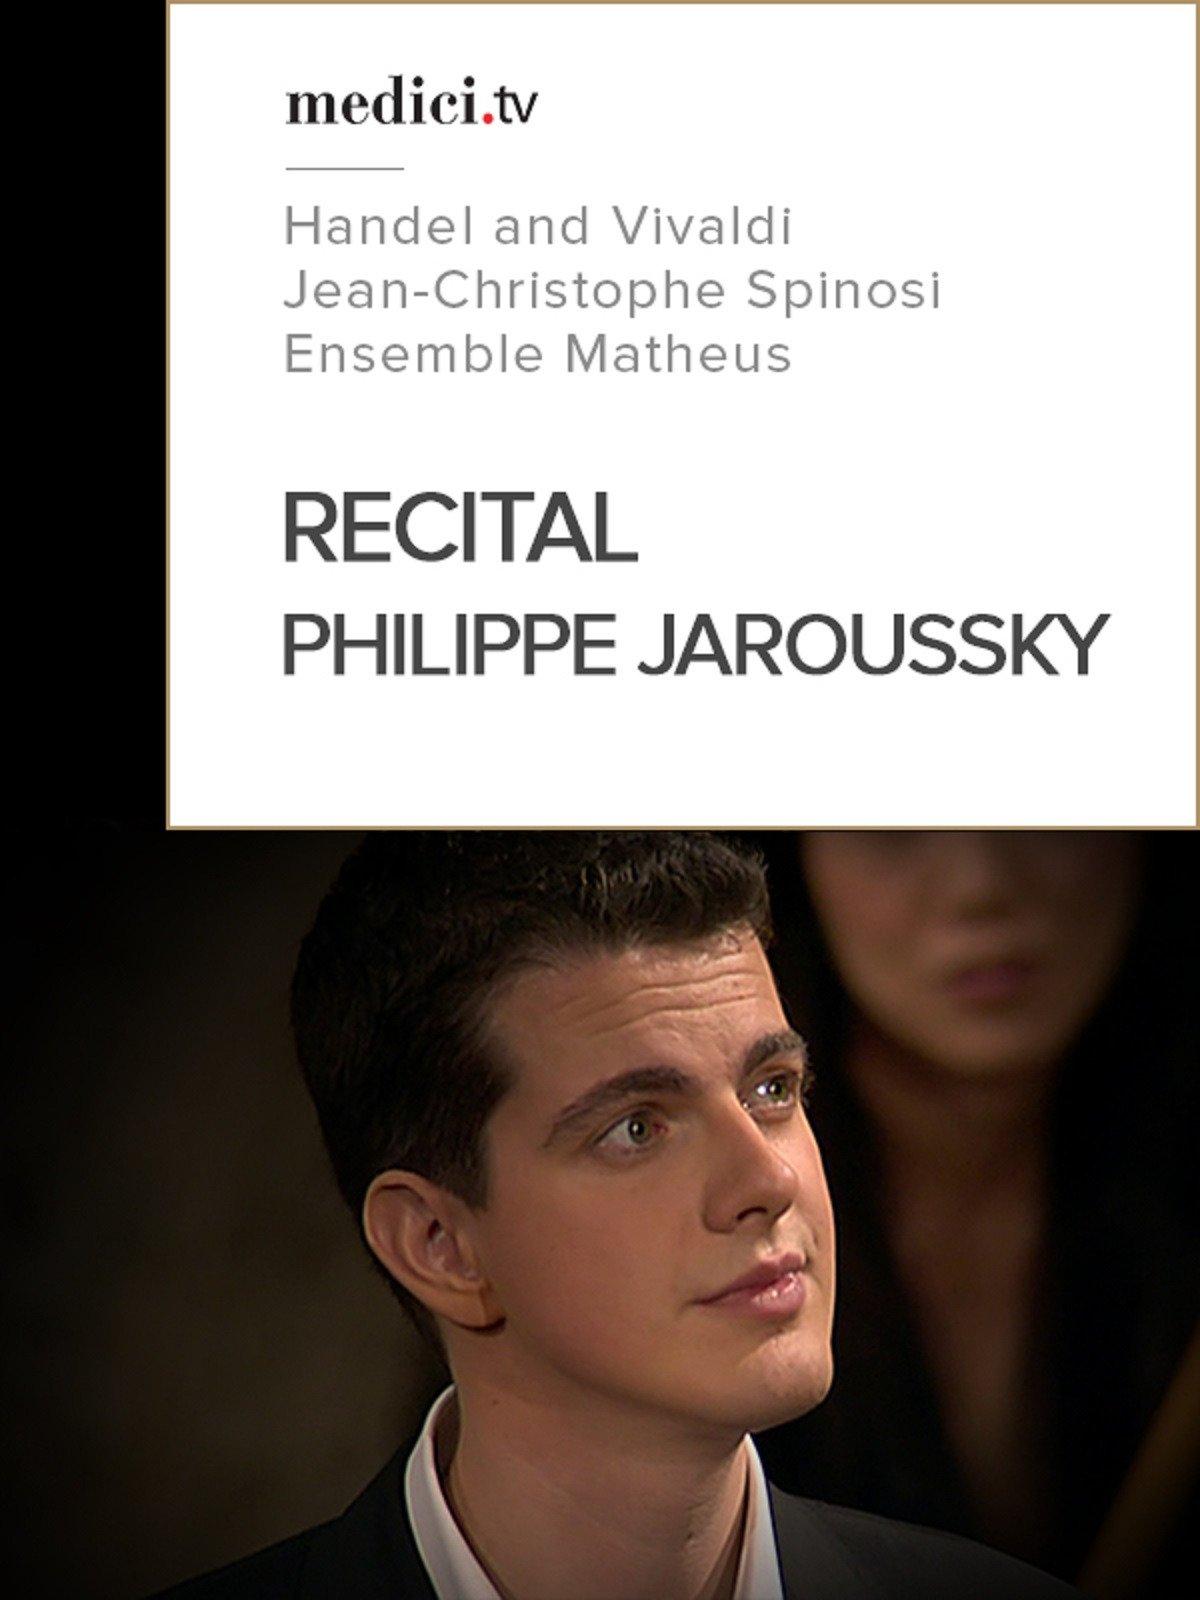 Recital, Philippe Jaroussky